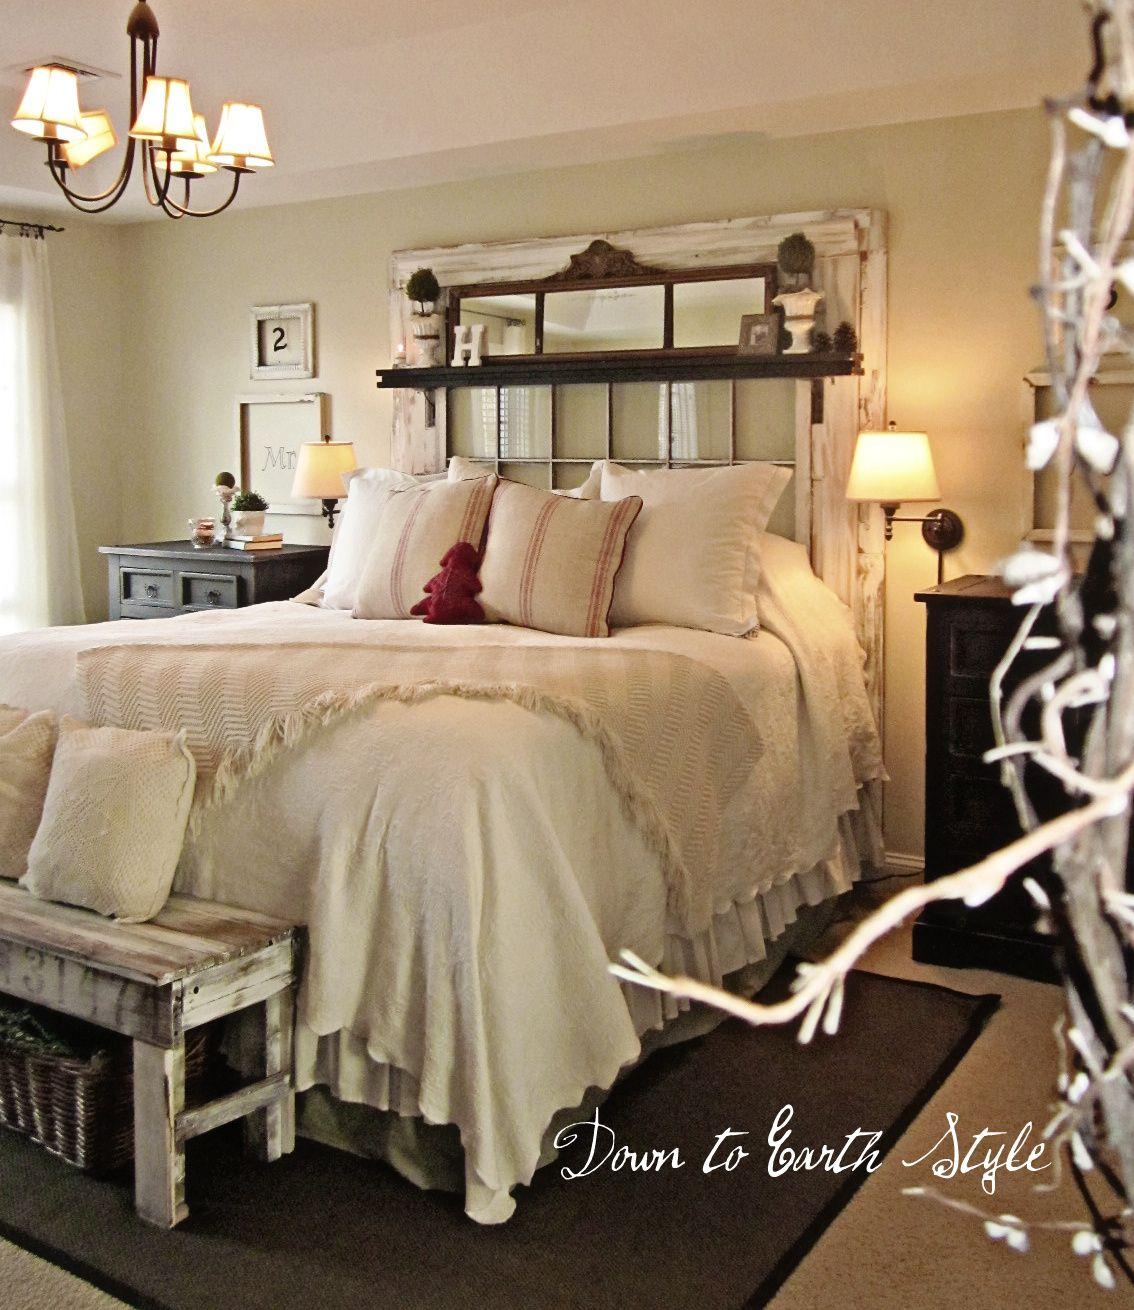 Master+Bedroom+006-1.jpg 1134×1310 pikseliä